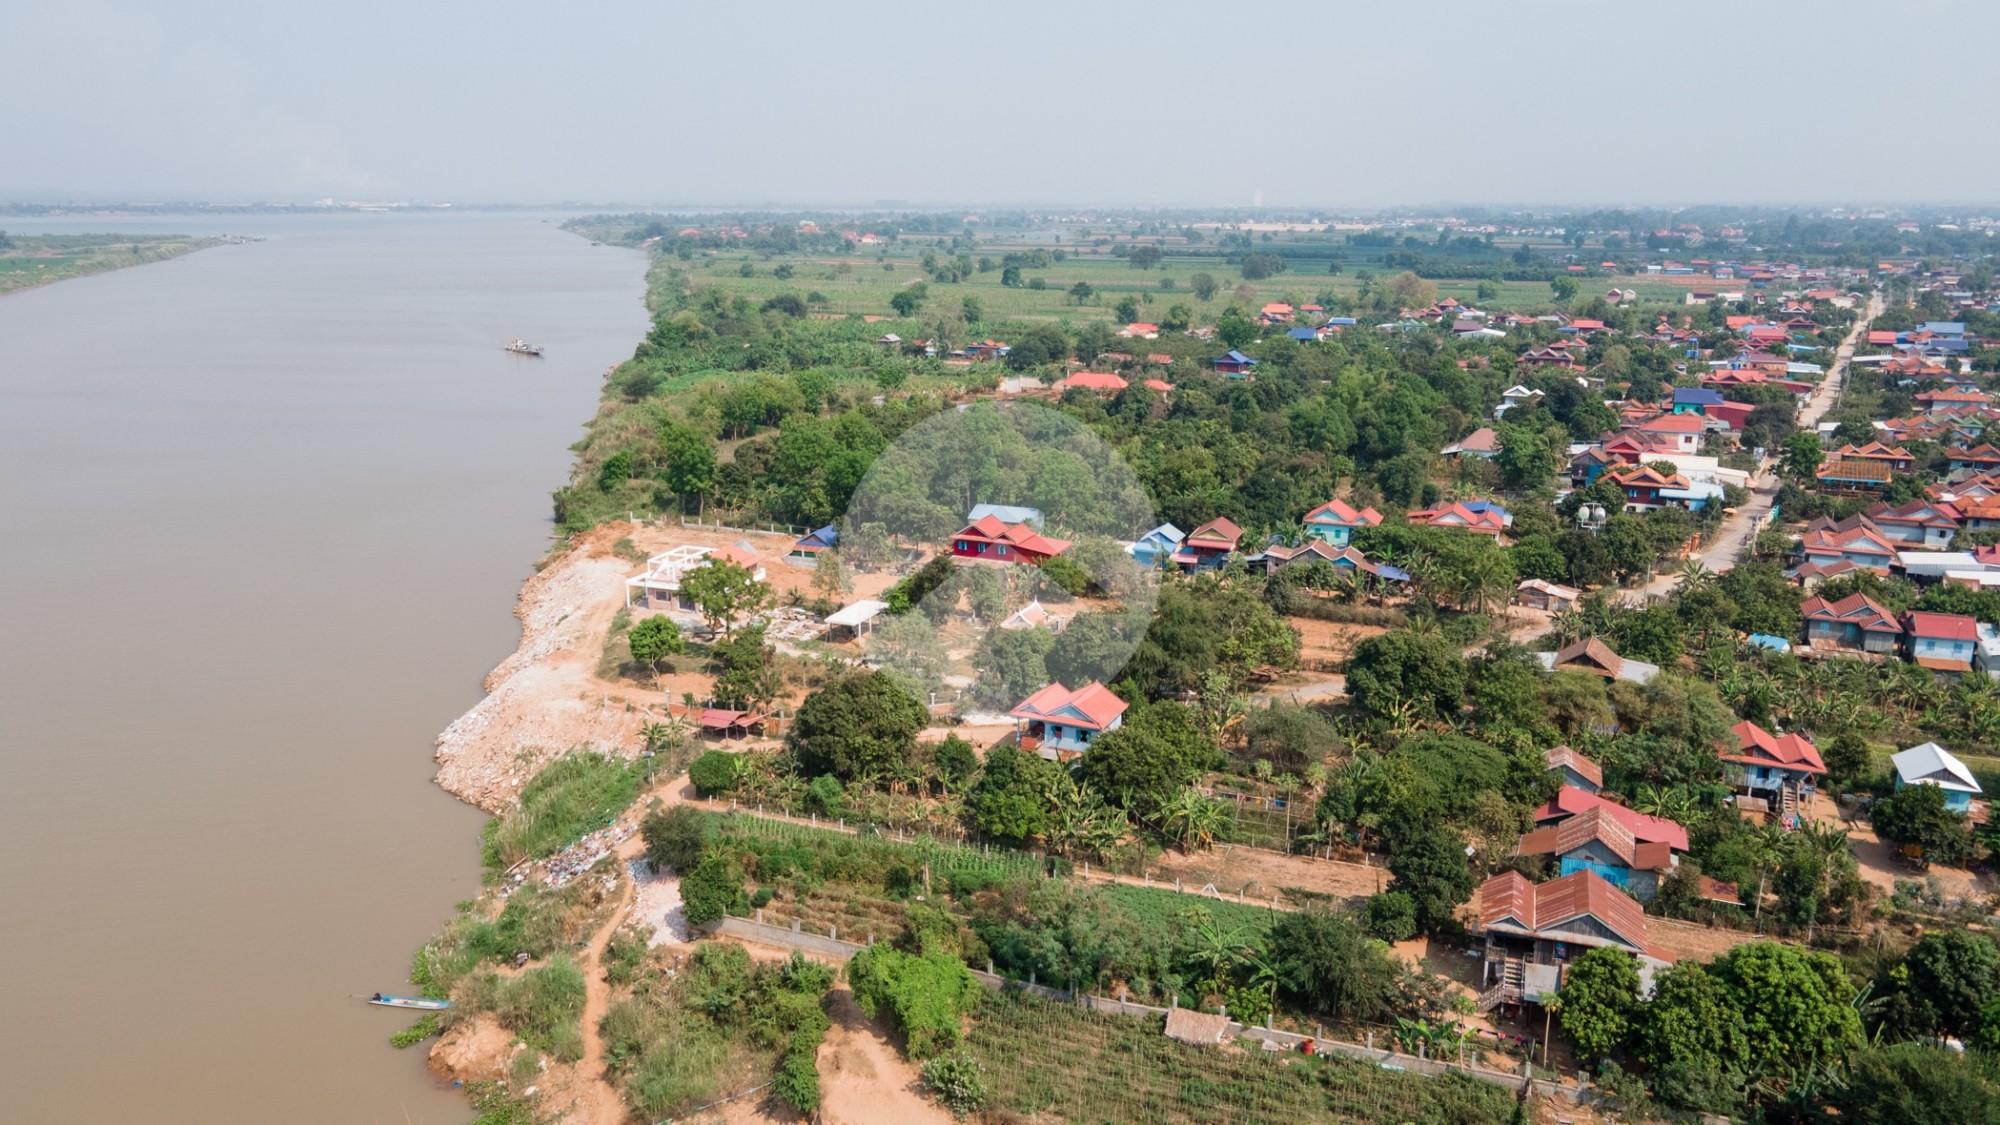 2736 Sqm Land For Rent - Chbar Ampov, Phnom Penh